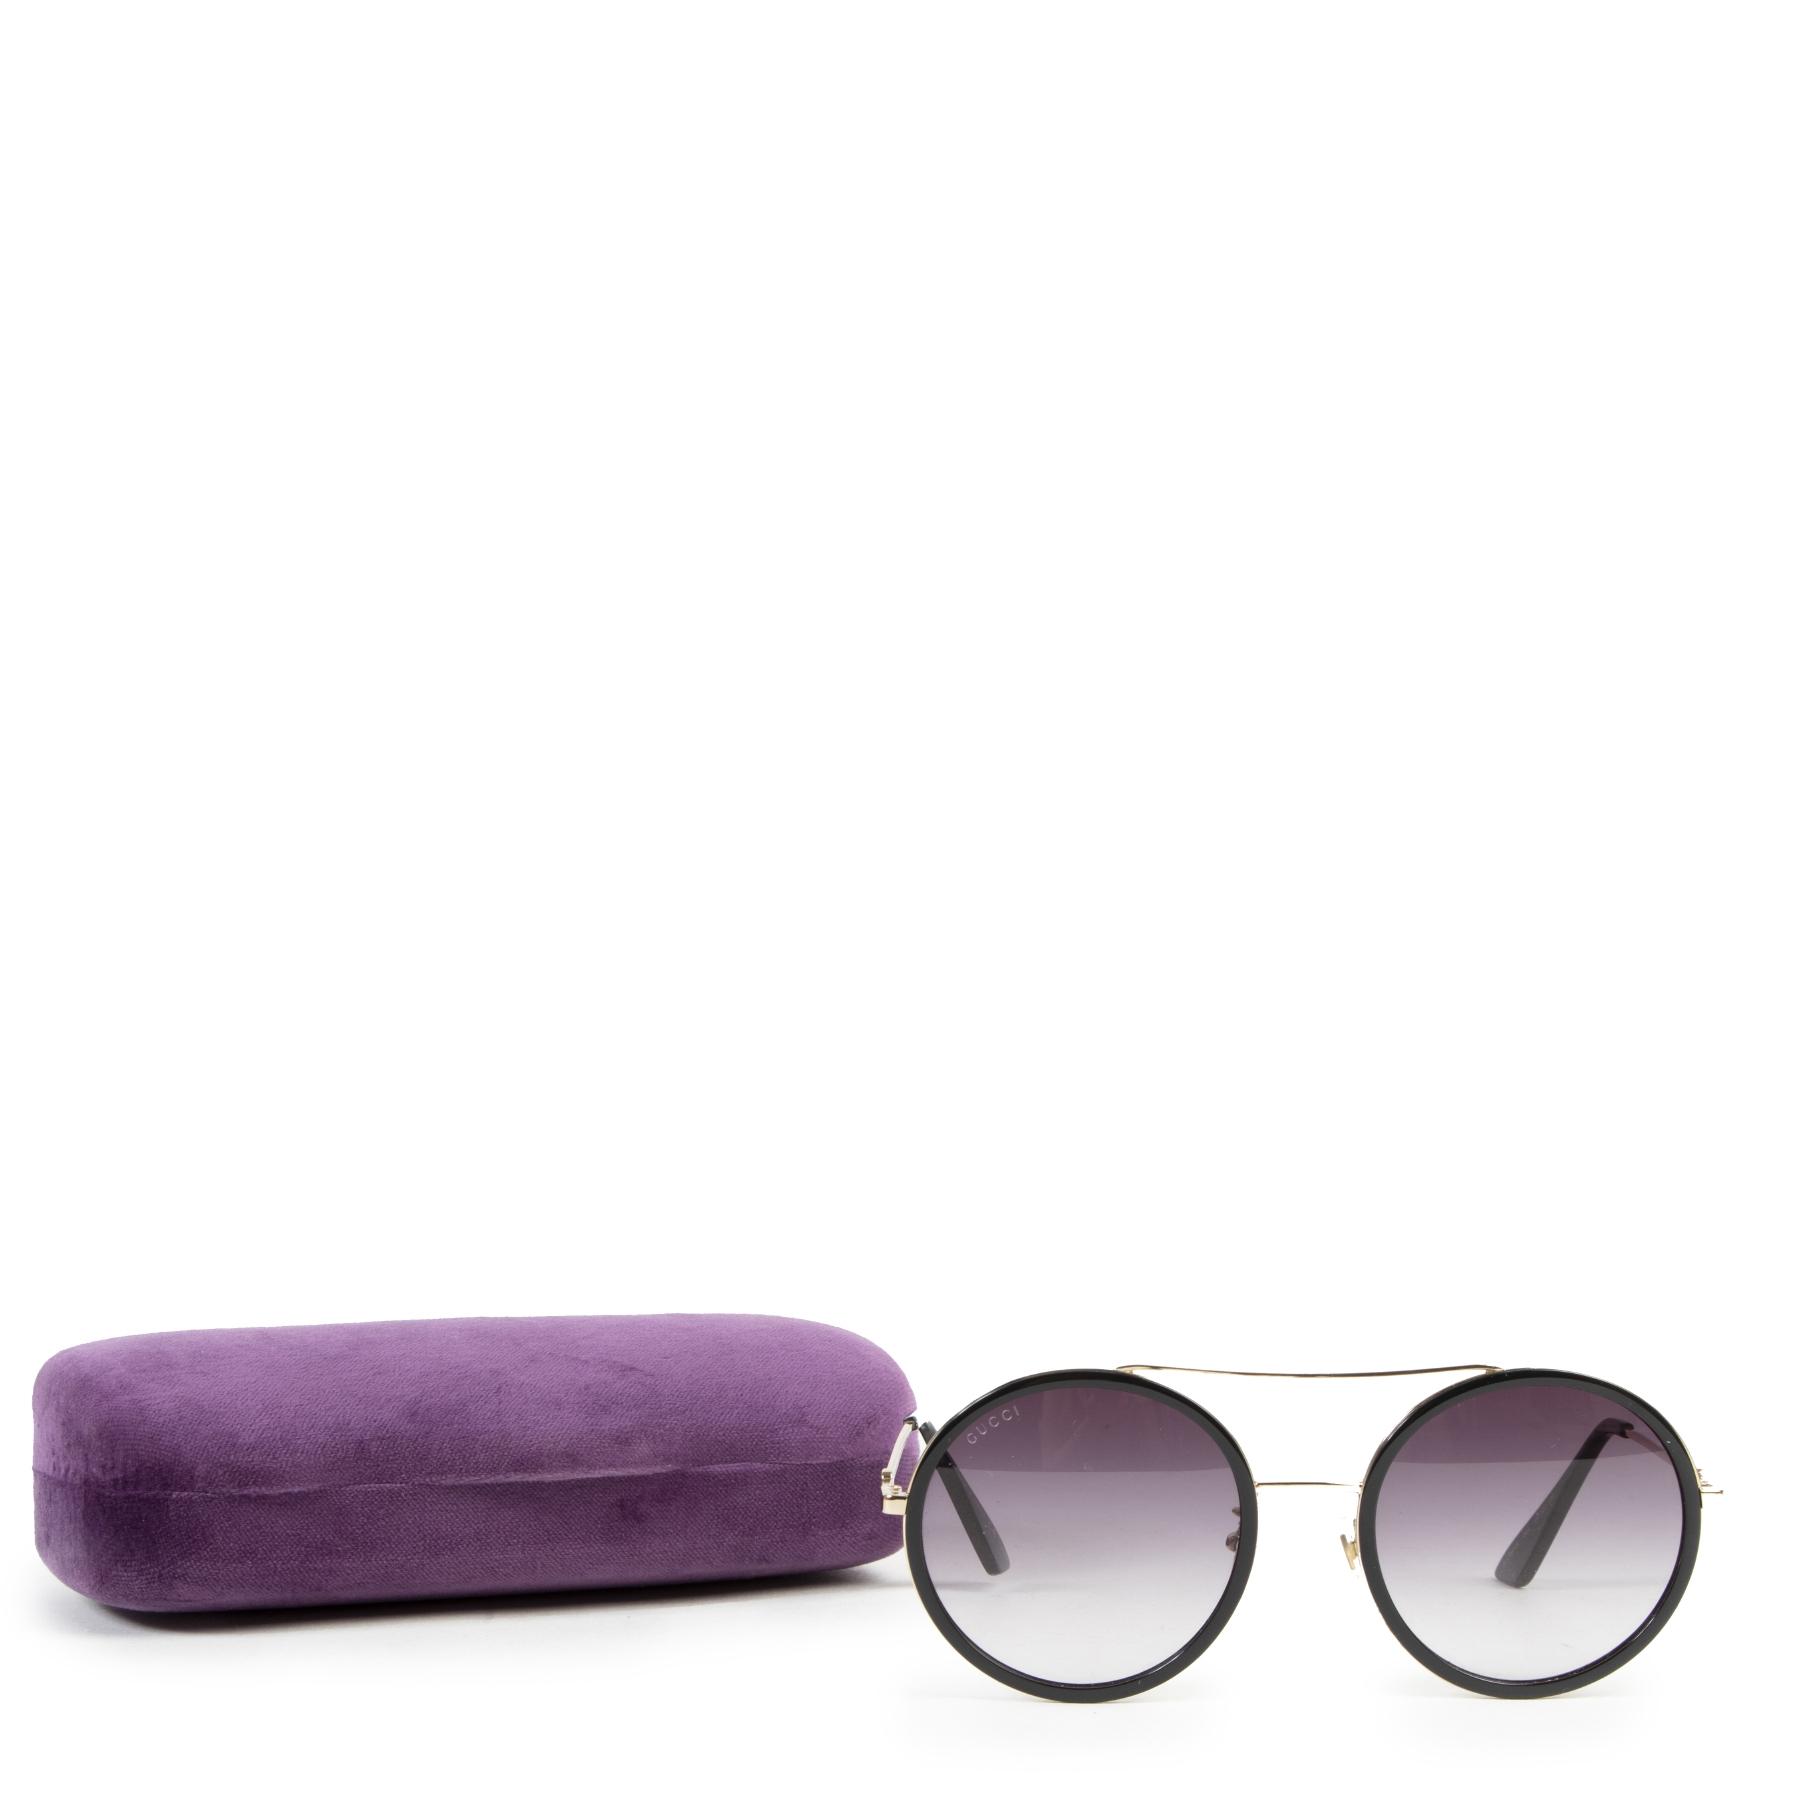 Authentieke tweedehands vintage Gucci Round Black Sunglasses koop online webshop LabelLOV